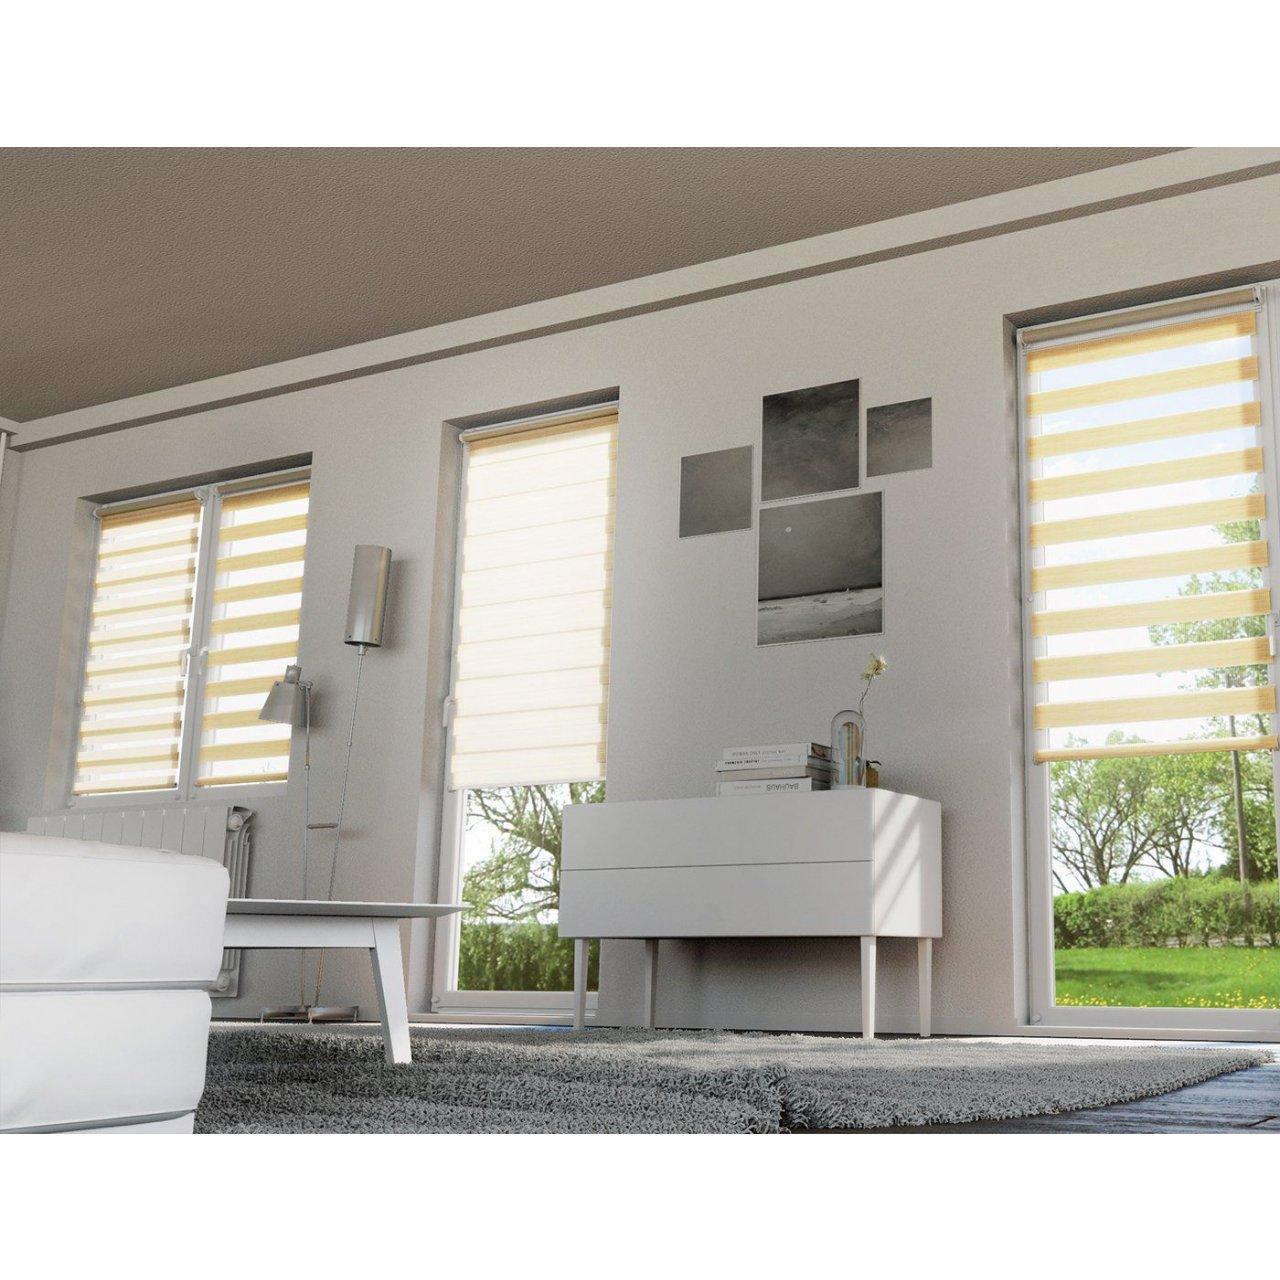 roleta okienna dzie noc 38x140 mleczny decodesign w. Black Bedroom Furniture Sets. Home Design Ideas